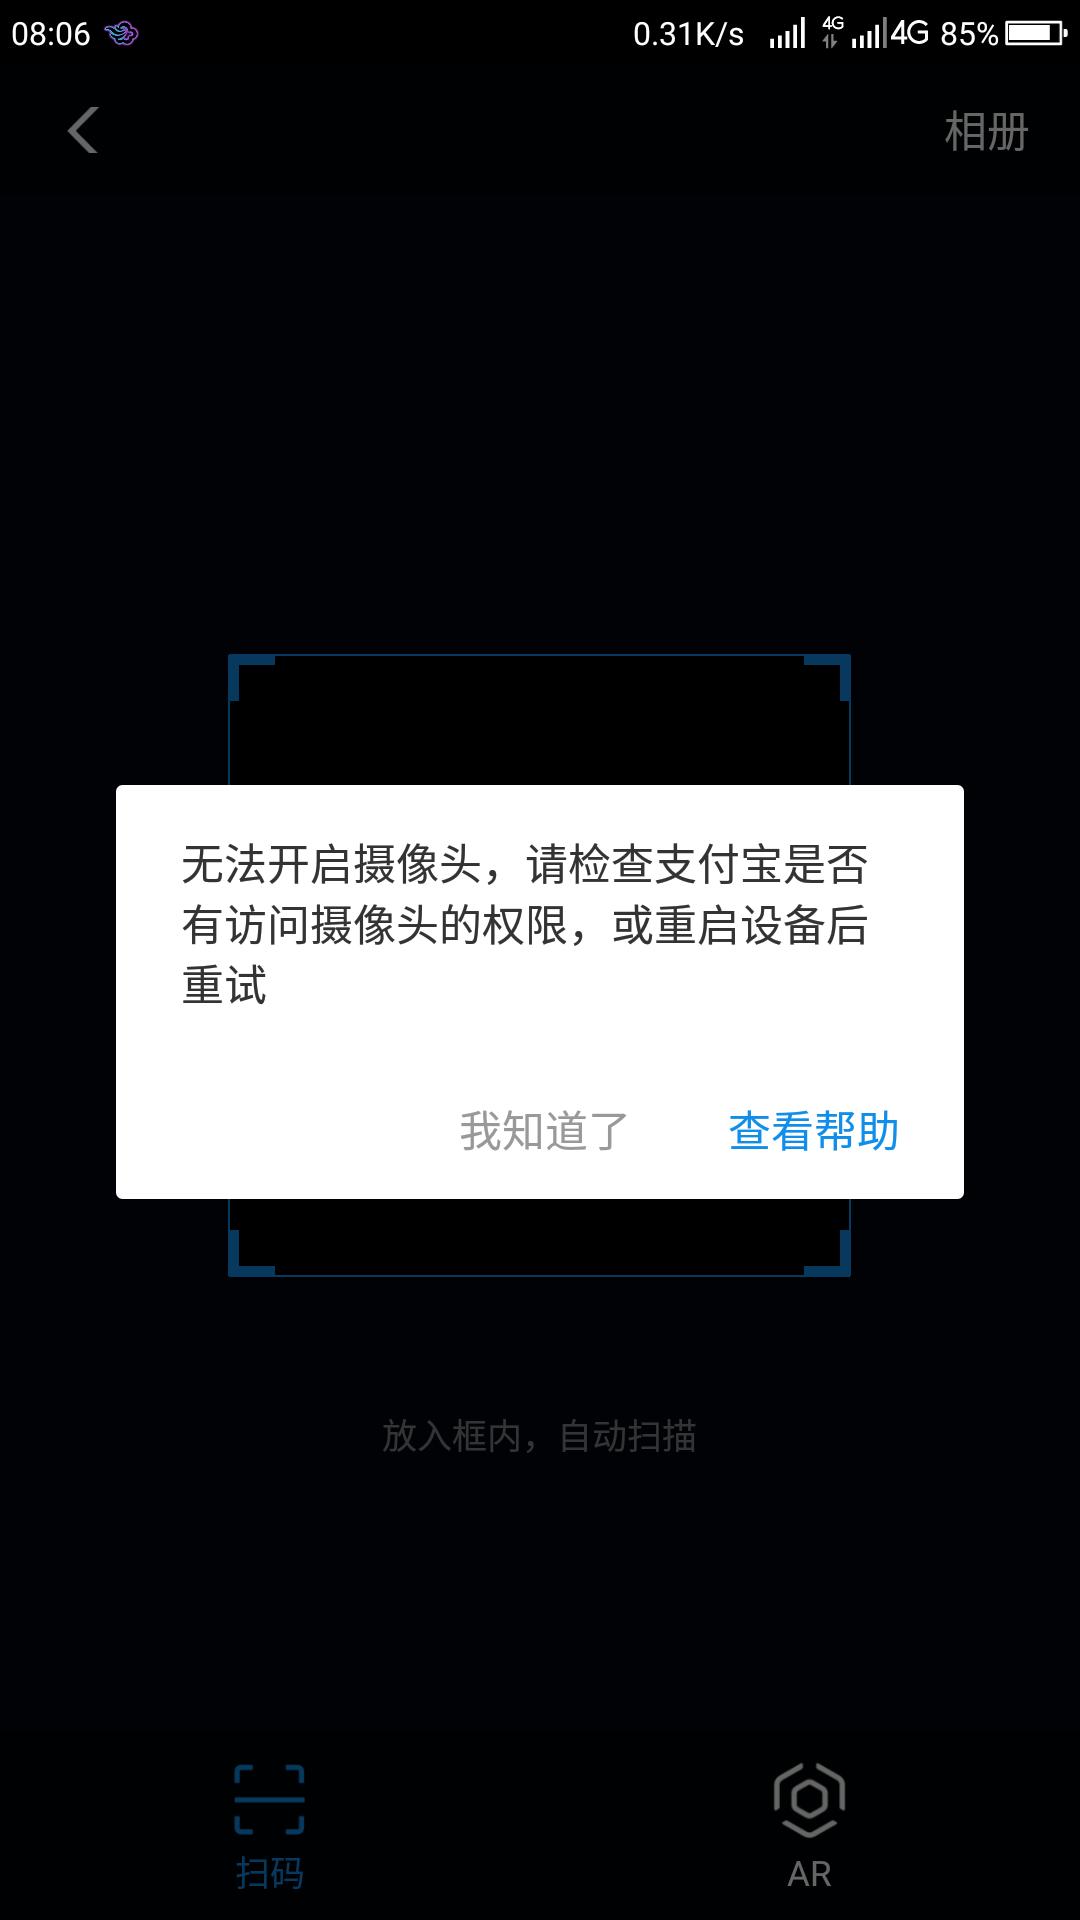 Screenshot_2018-10-24-08-06-11.png